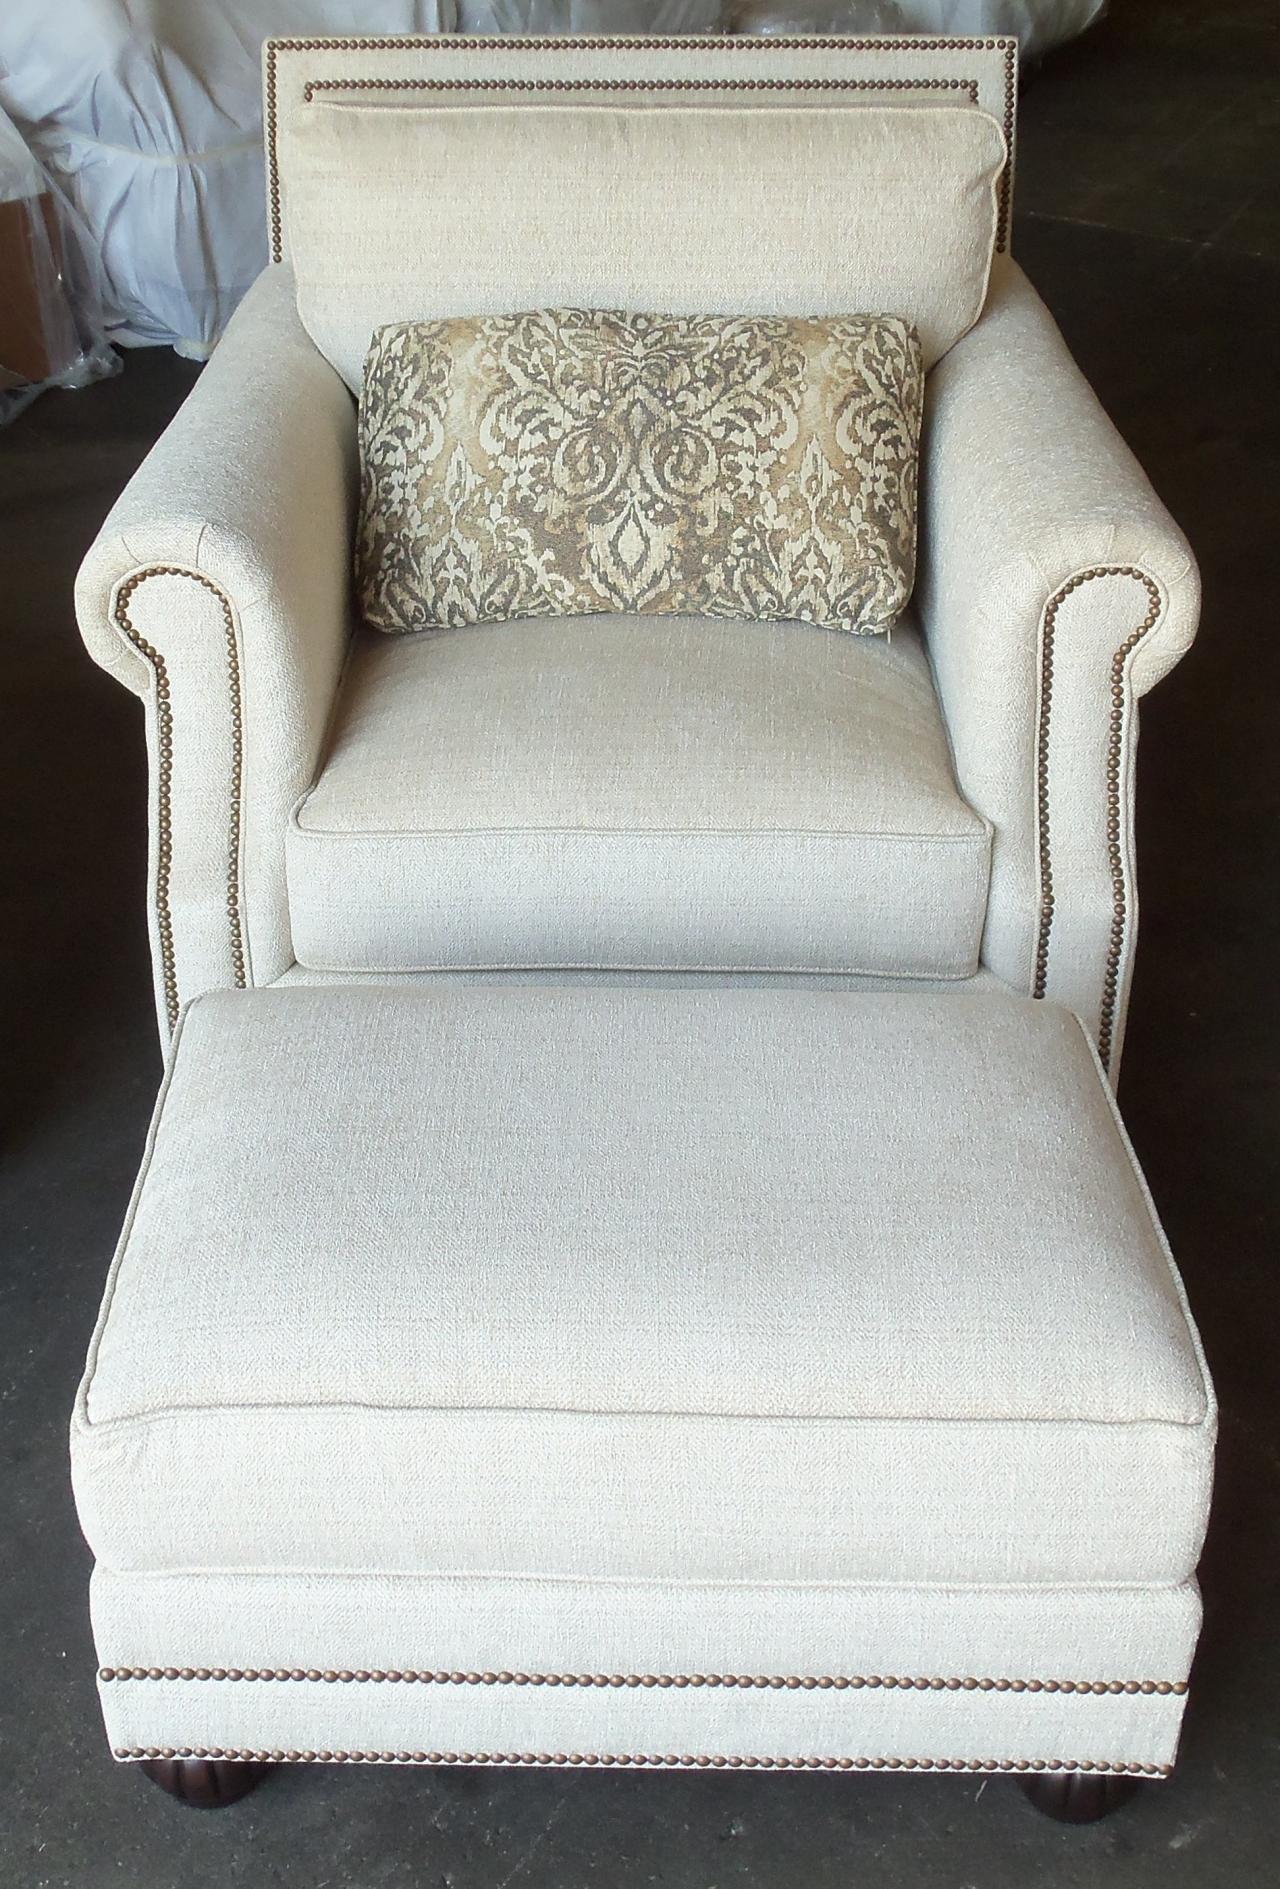 sofa with recliners slipcover grey sofas for sale uk barnett furniture - king hickory julianna